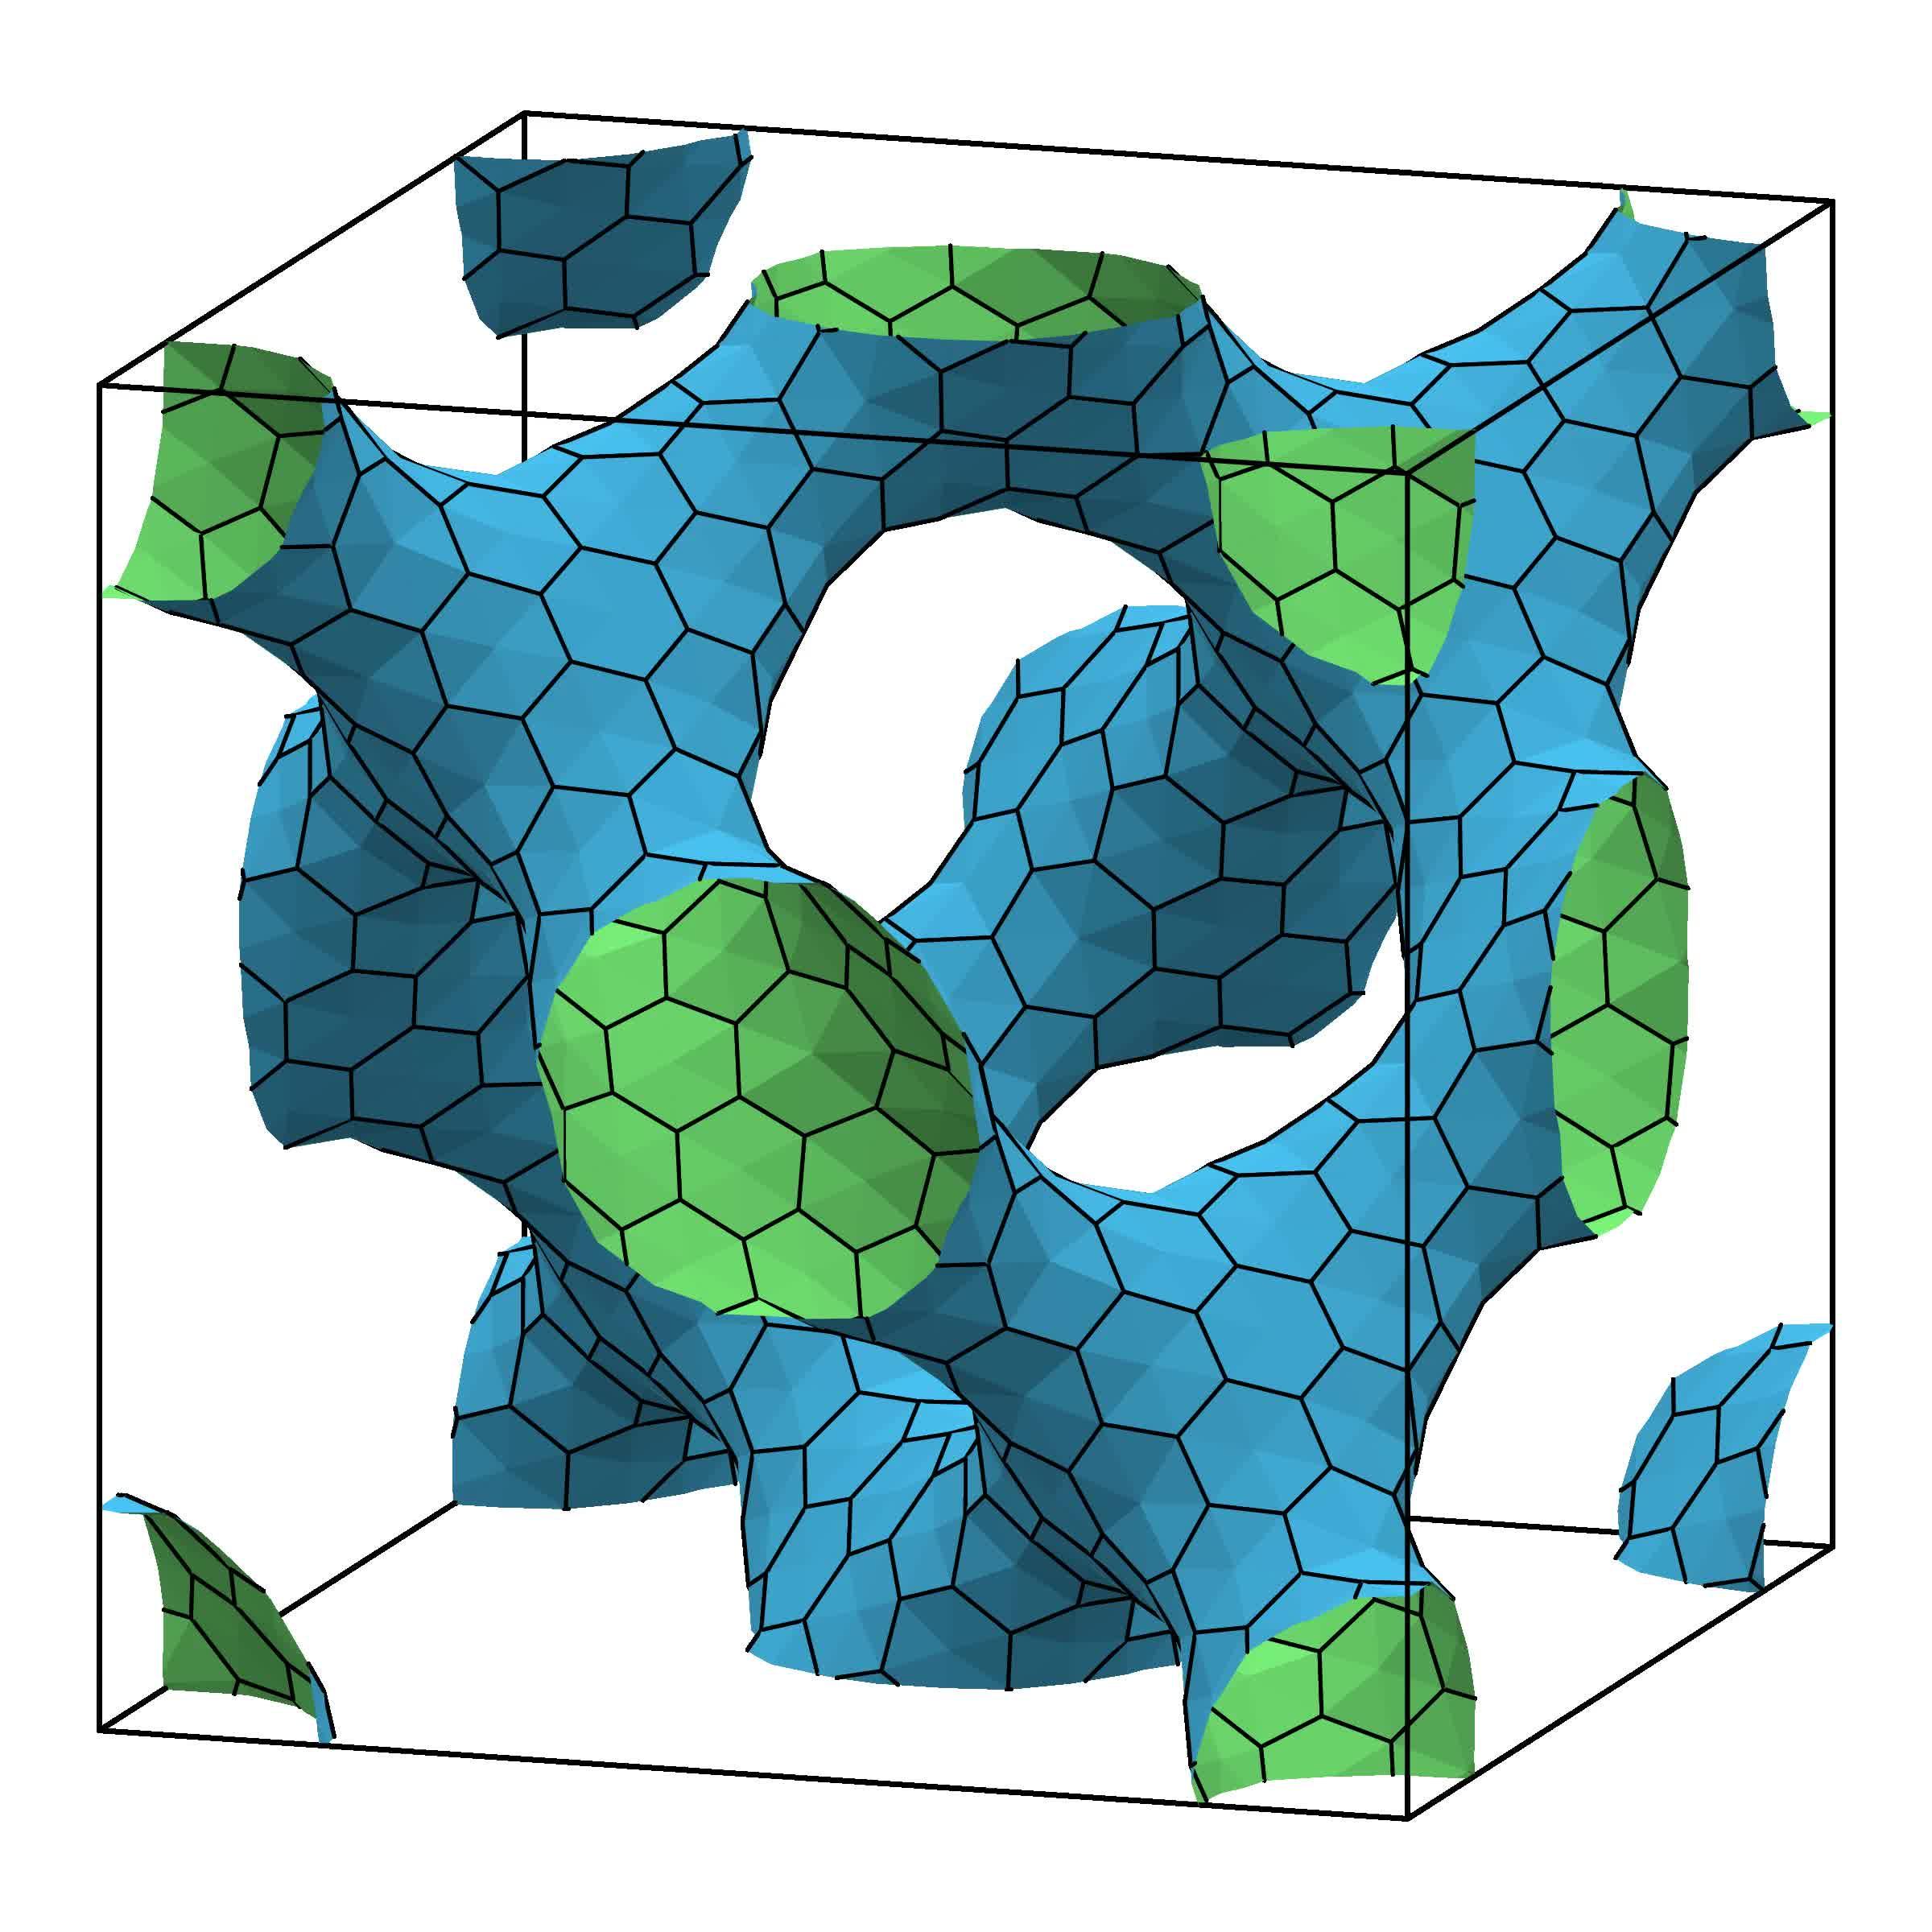 Generating carbon schwarzites via zeolite-templating | PNAS